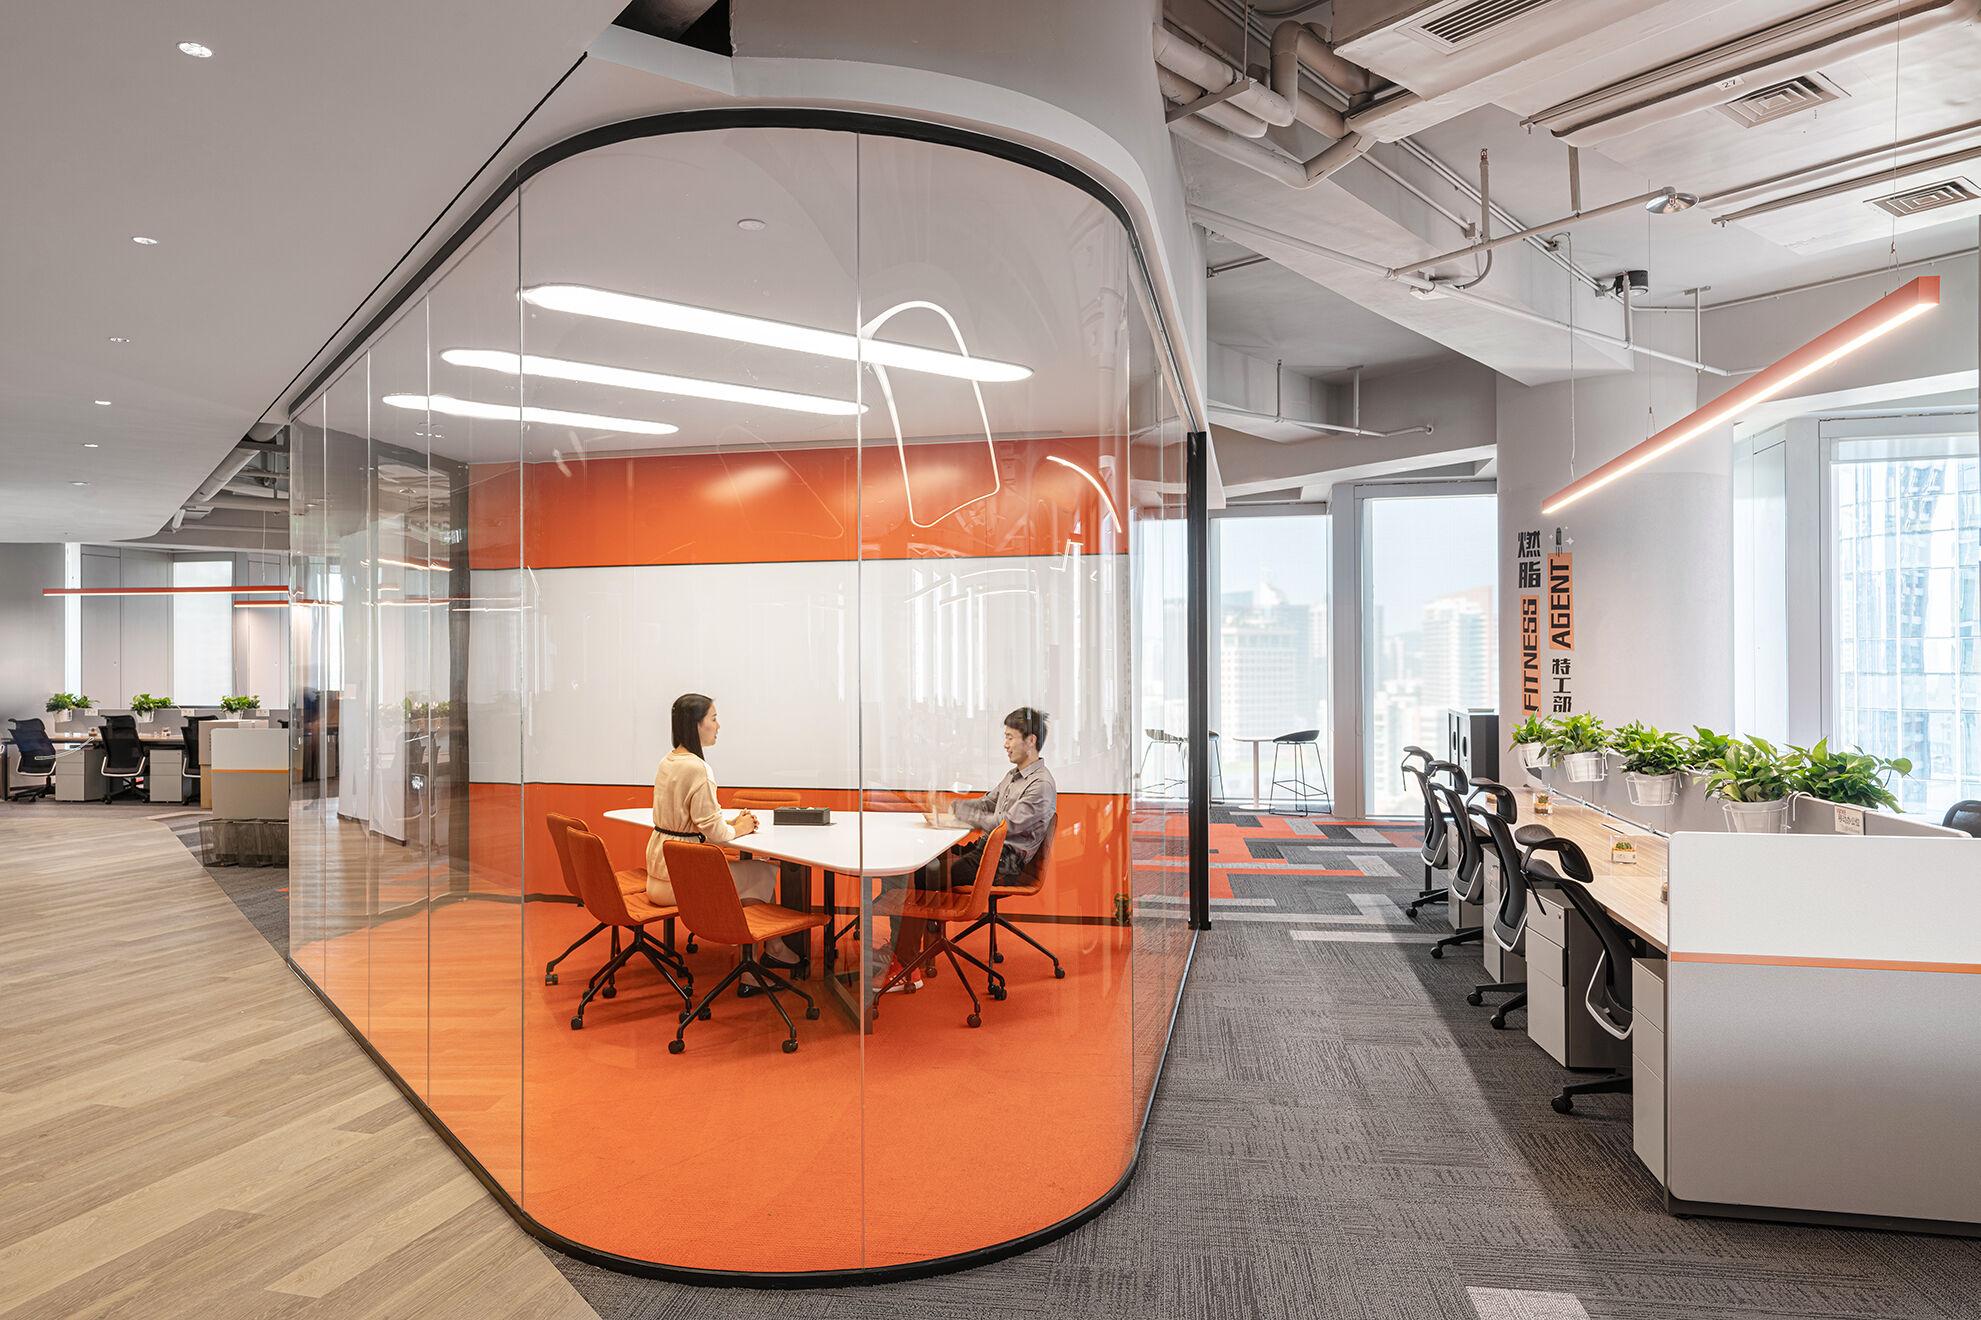 Vanke_Designed by corporate interior designers Space Matrix